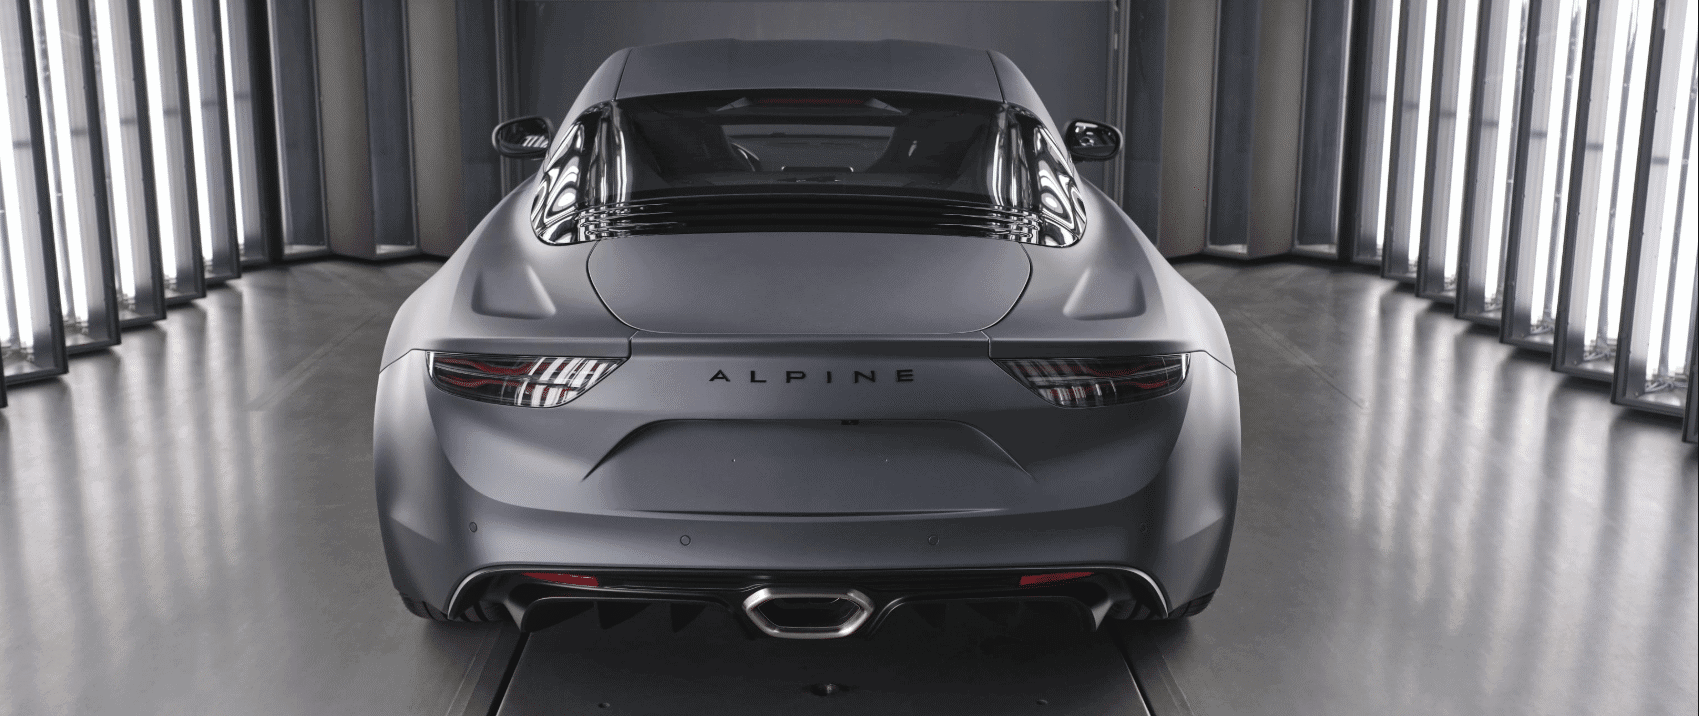 alpine a110s sports car